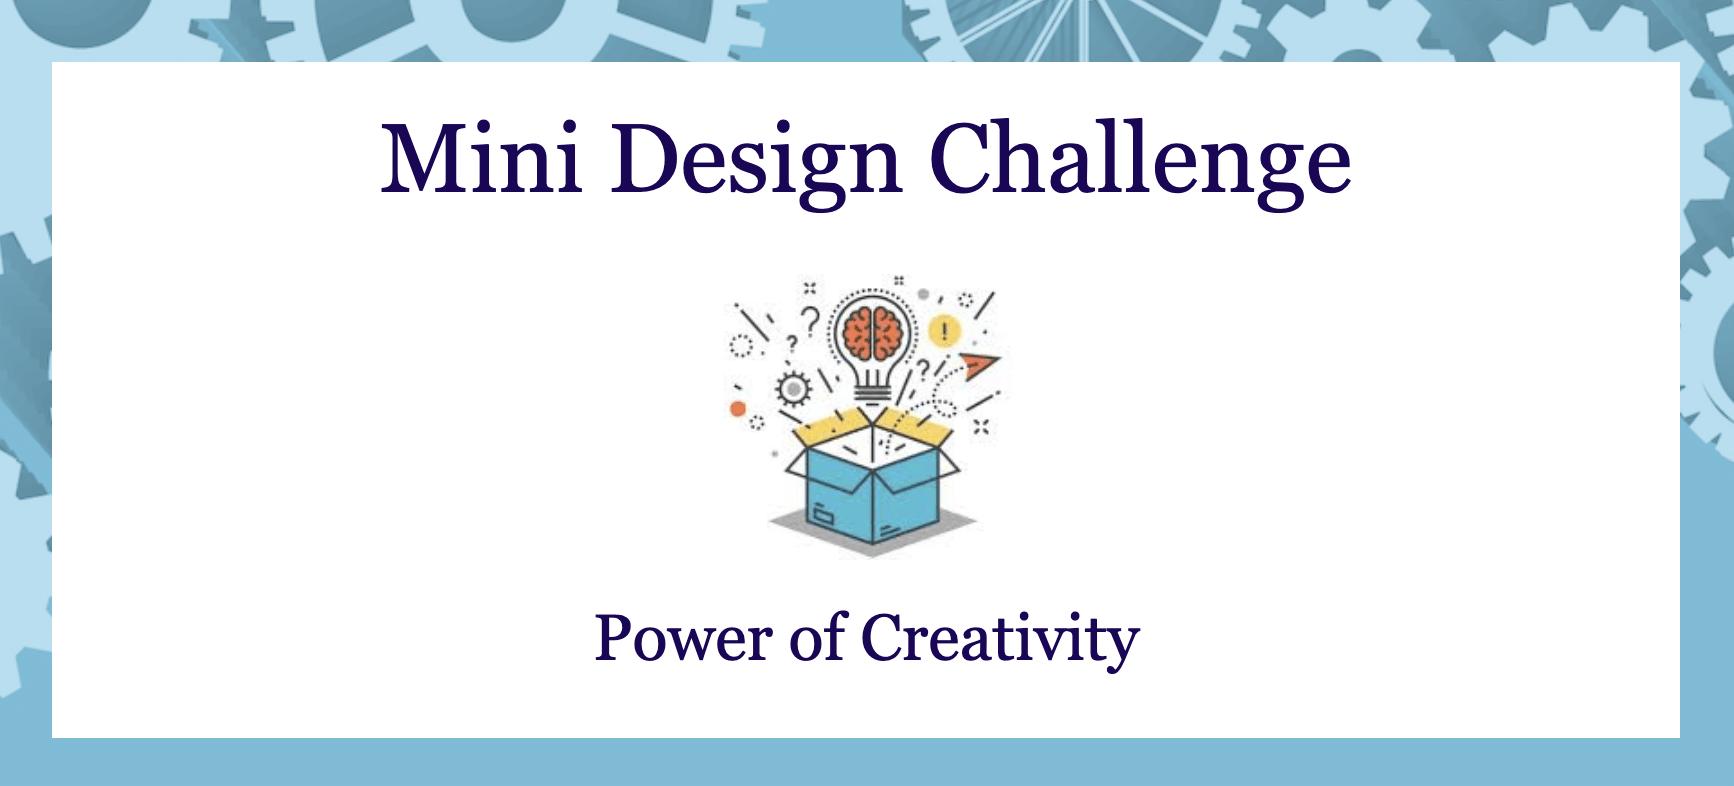 Power of Creativity Challenge